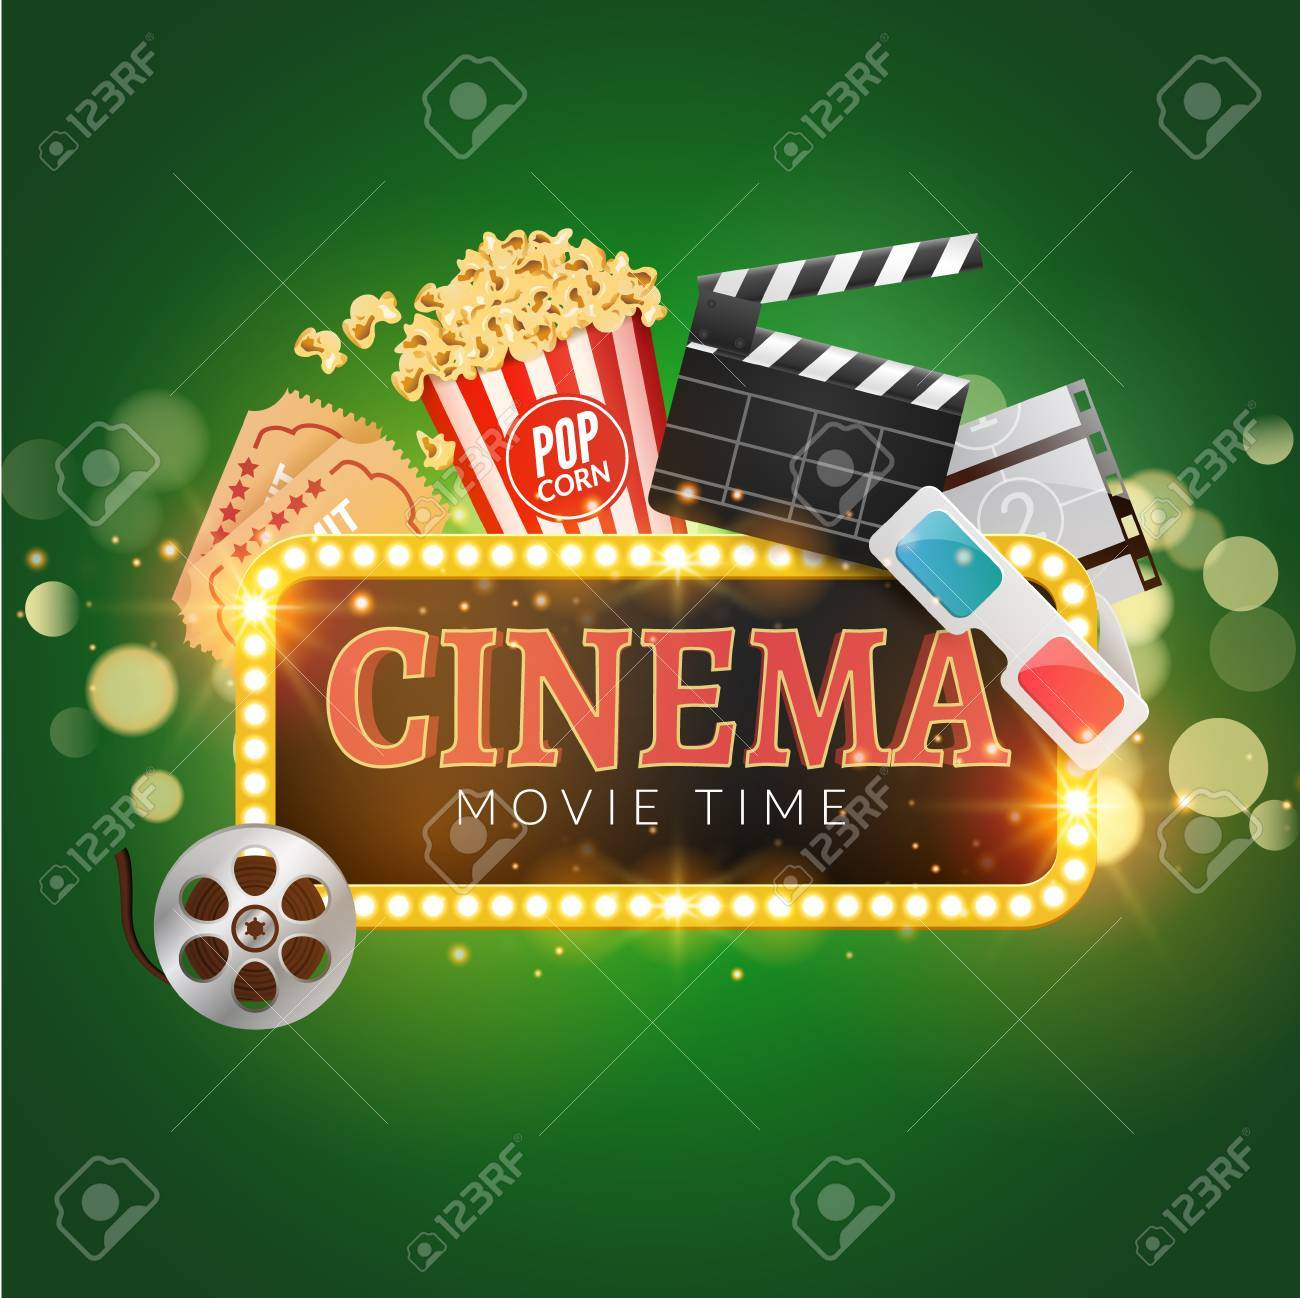 Cinema Movie Vector Poster Design Template Popcorn Filmstrip Clapboard Tickets